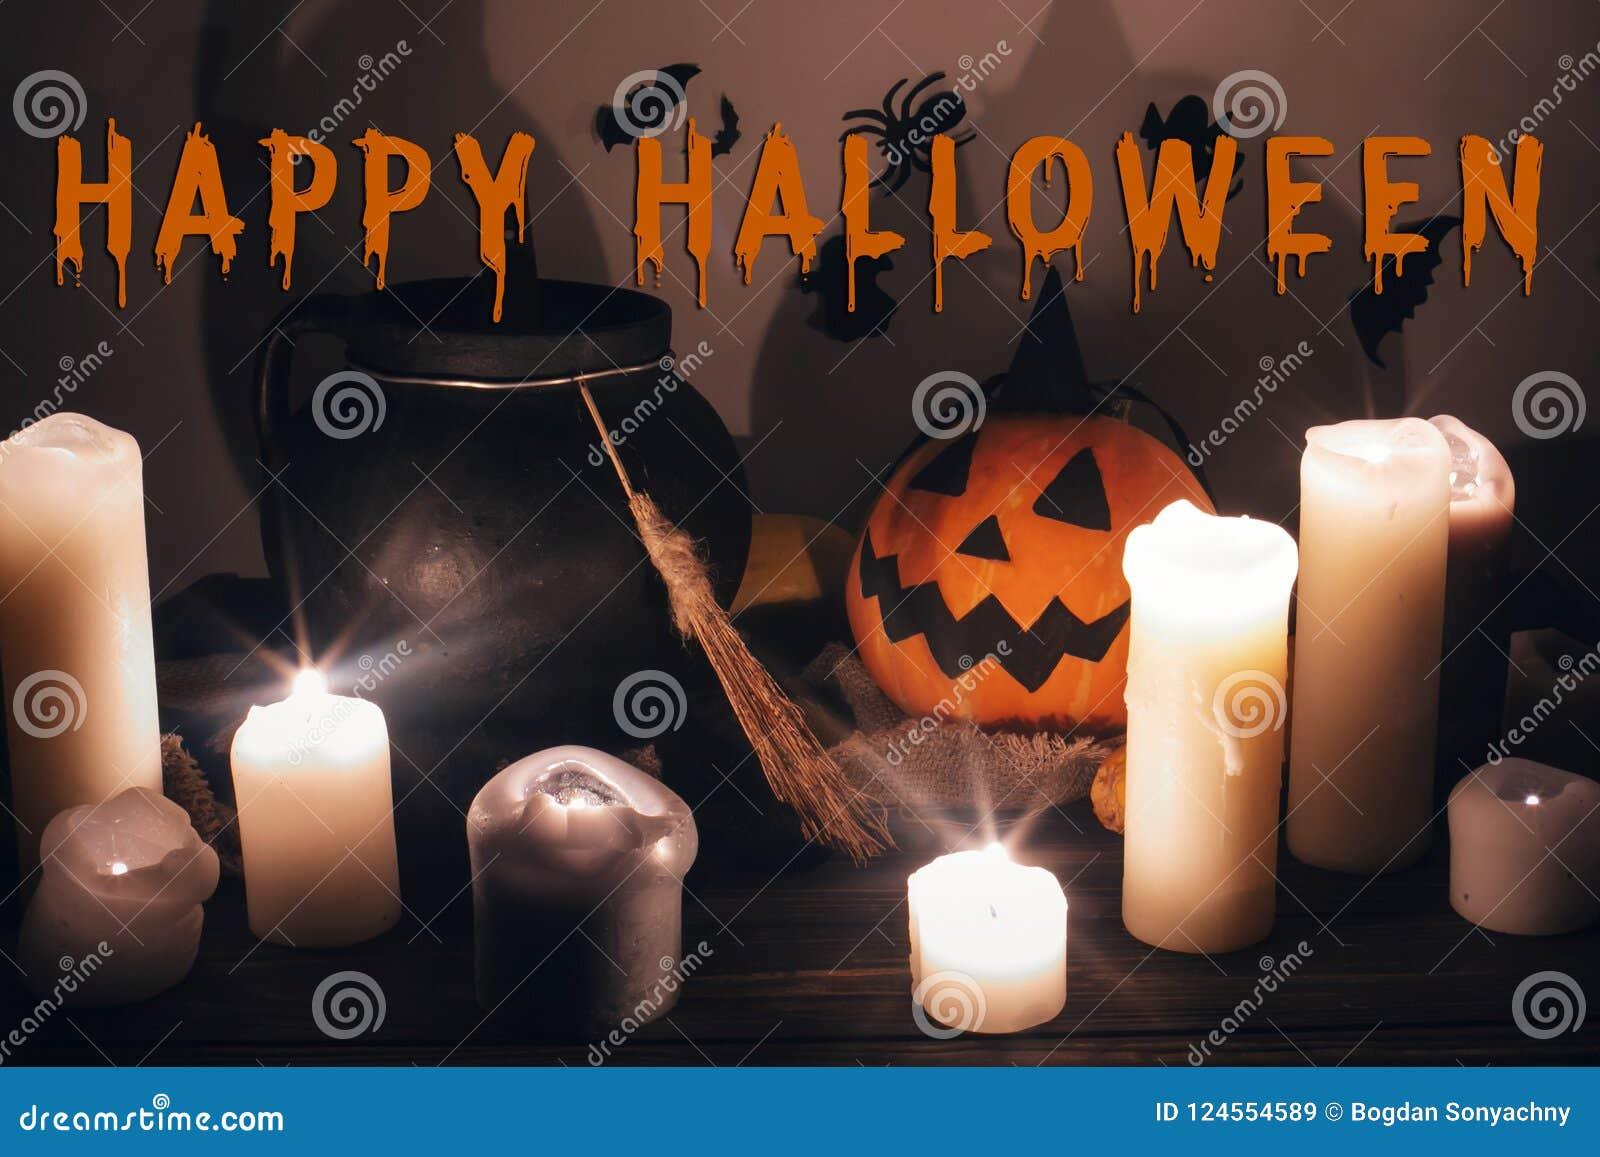 happy halloween text concept. seasons greeting, spooky halloween